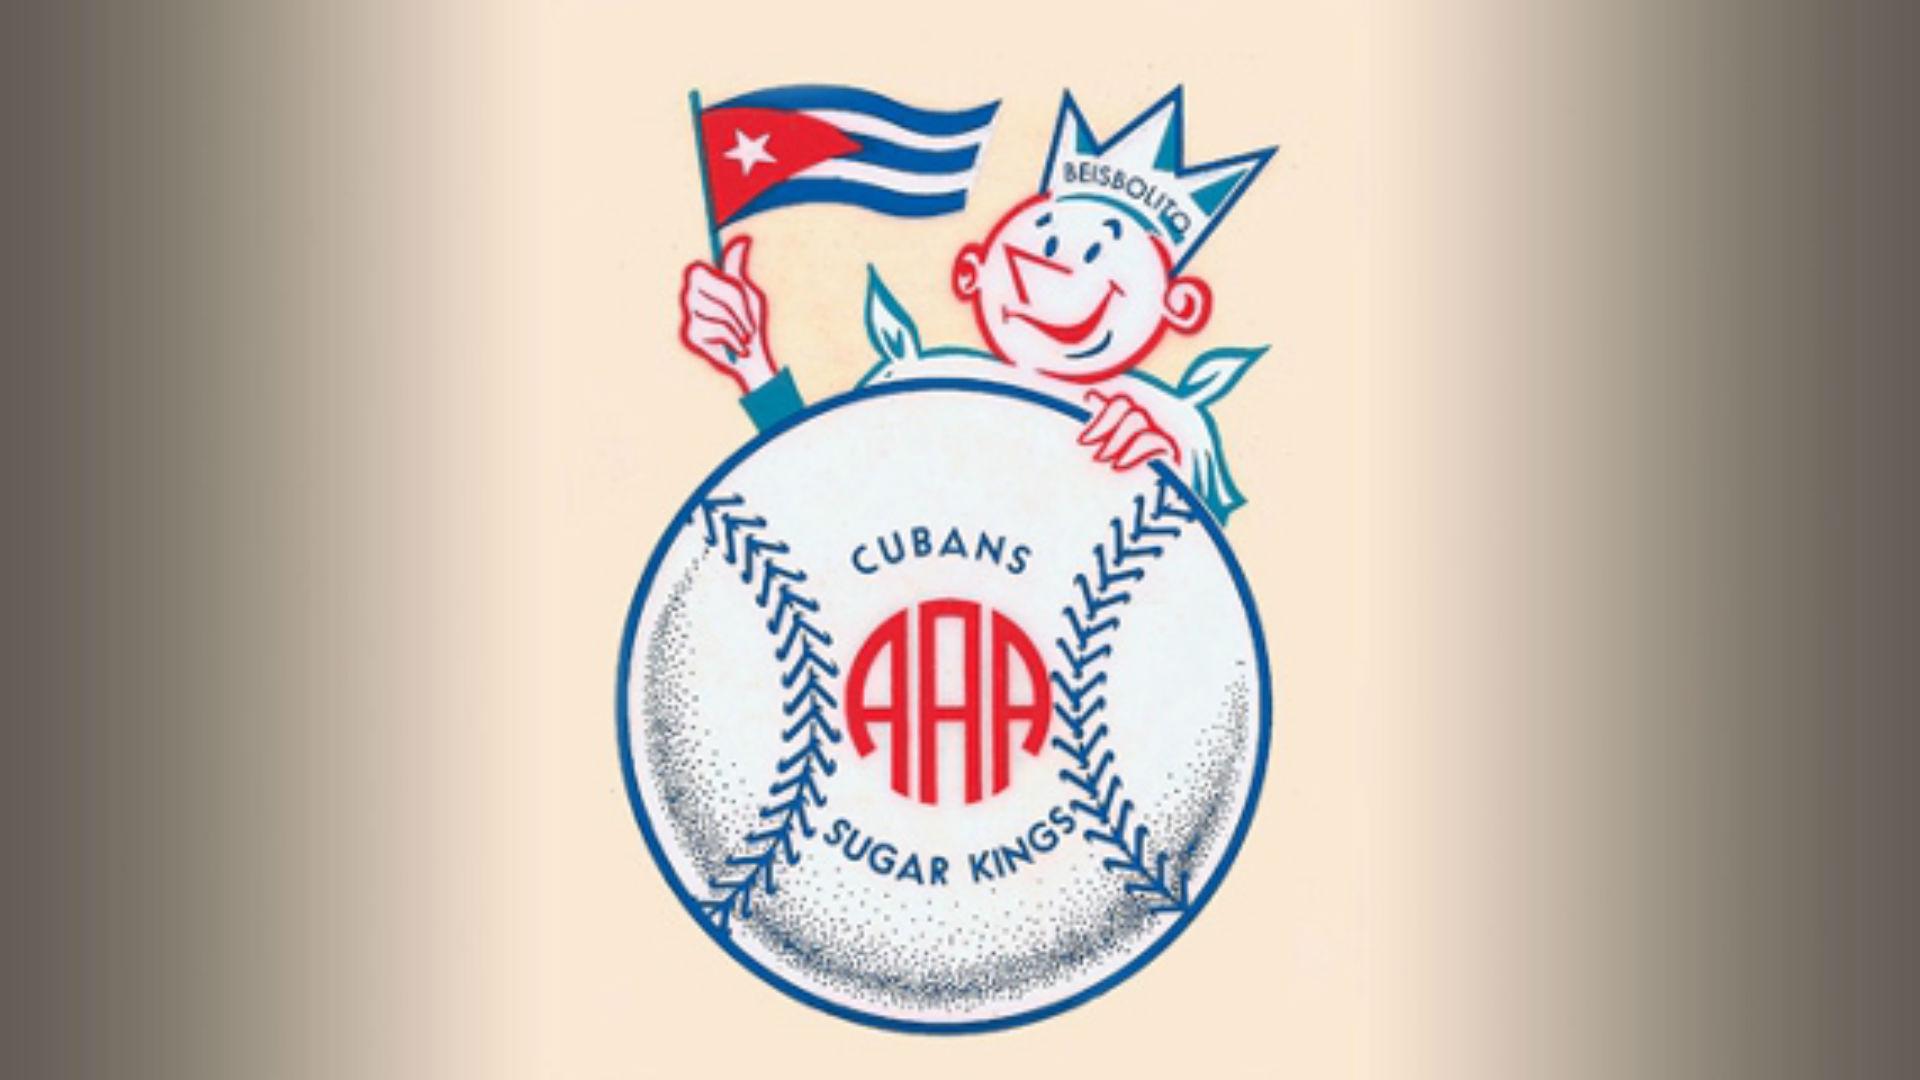 havana-sugar-kings-logo-FTR.jpg